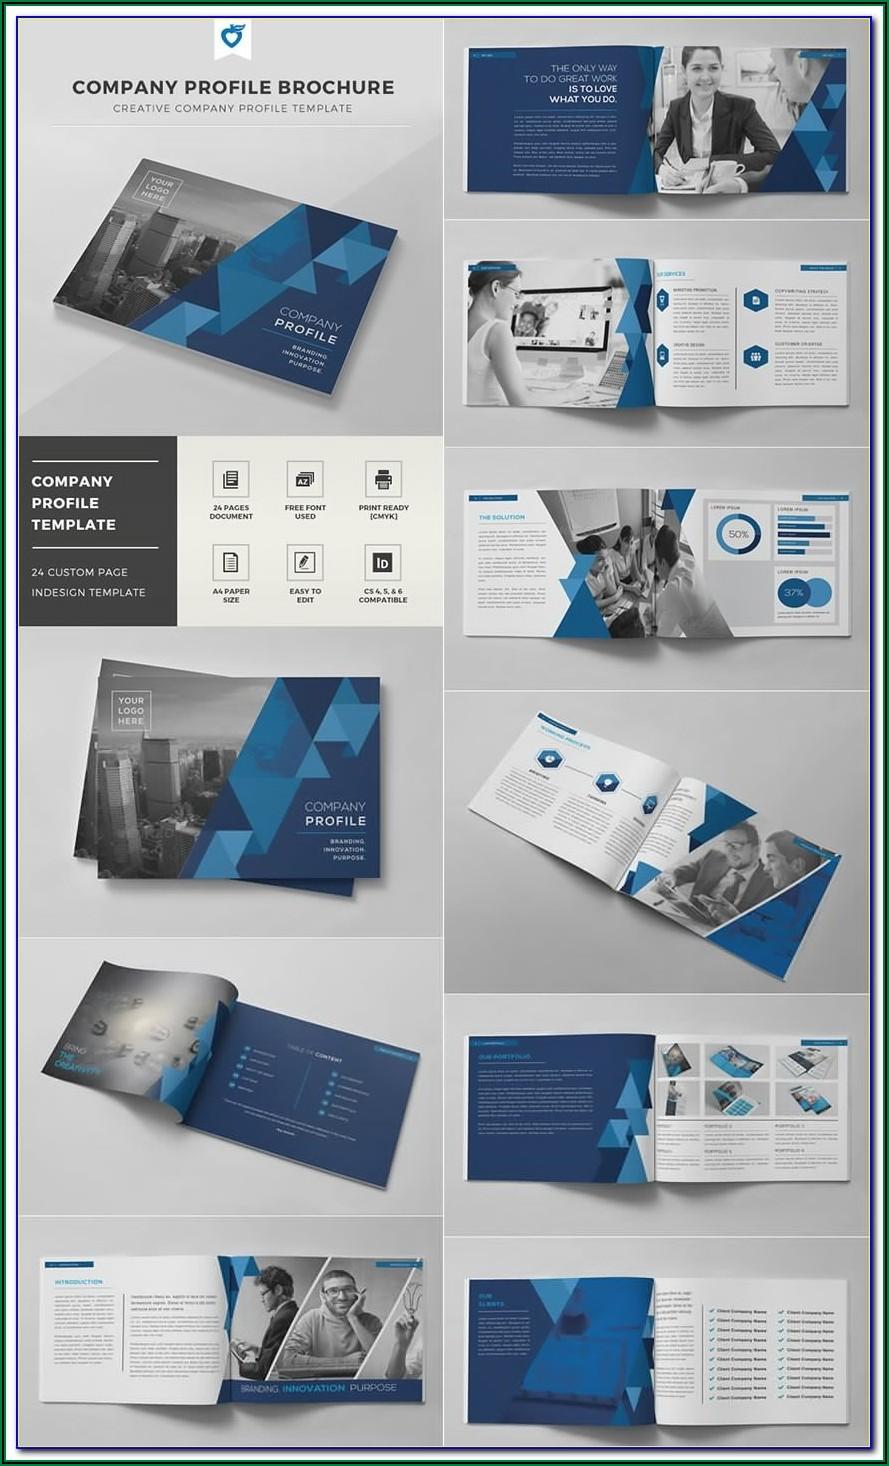 8.5 X 11 Half Fold Brochure Template